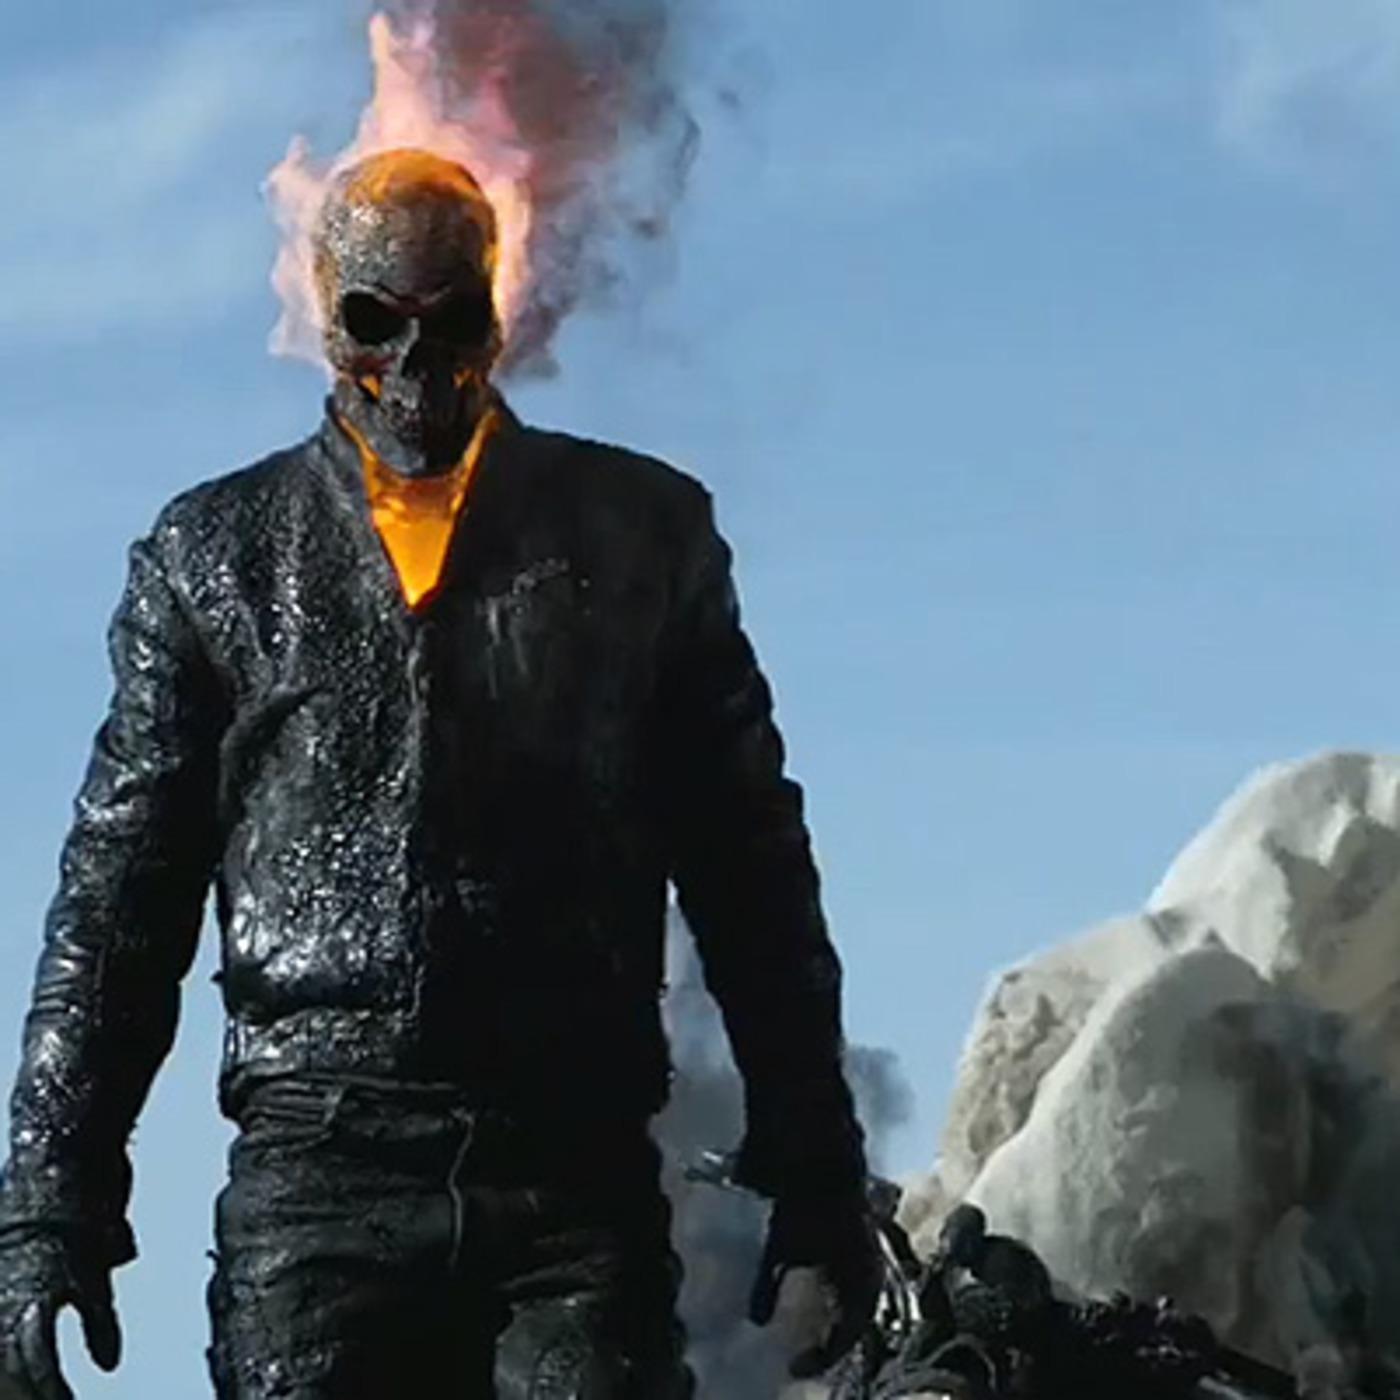 Ghost Rider Costume Купить Ghost Rider Costume недорого из Китая на 48